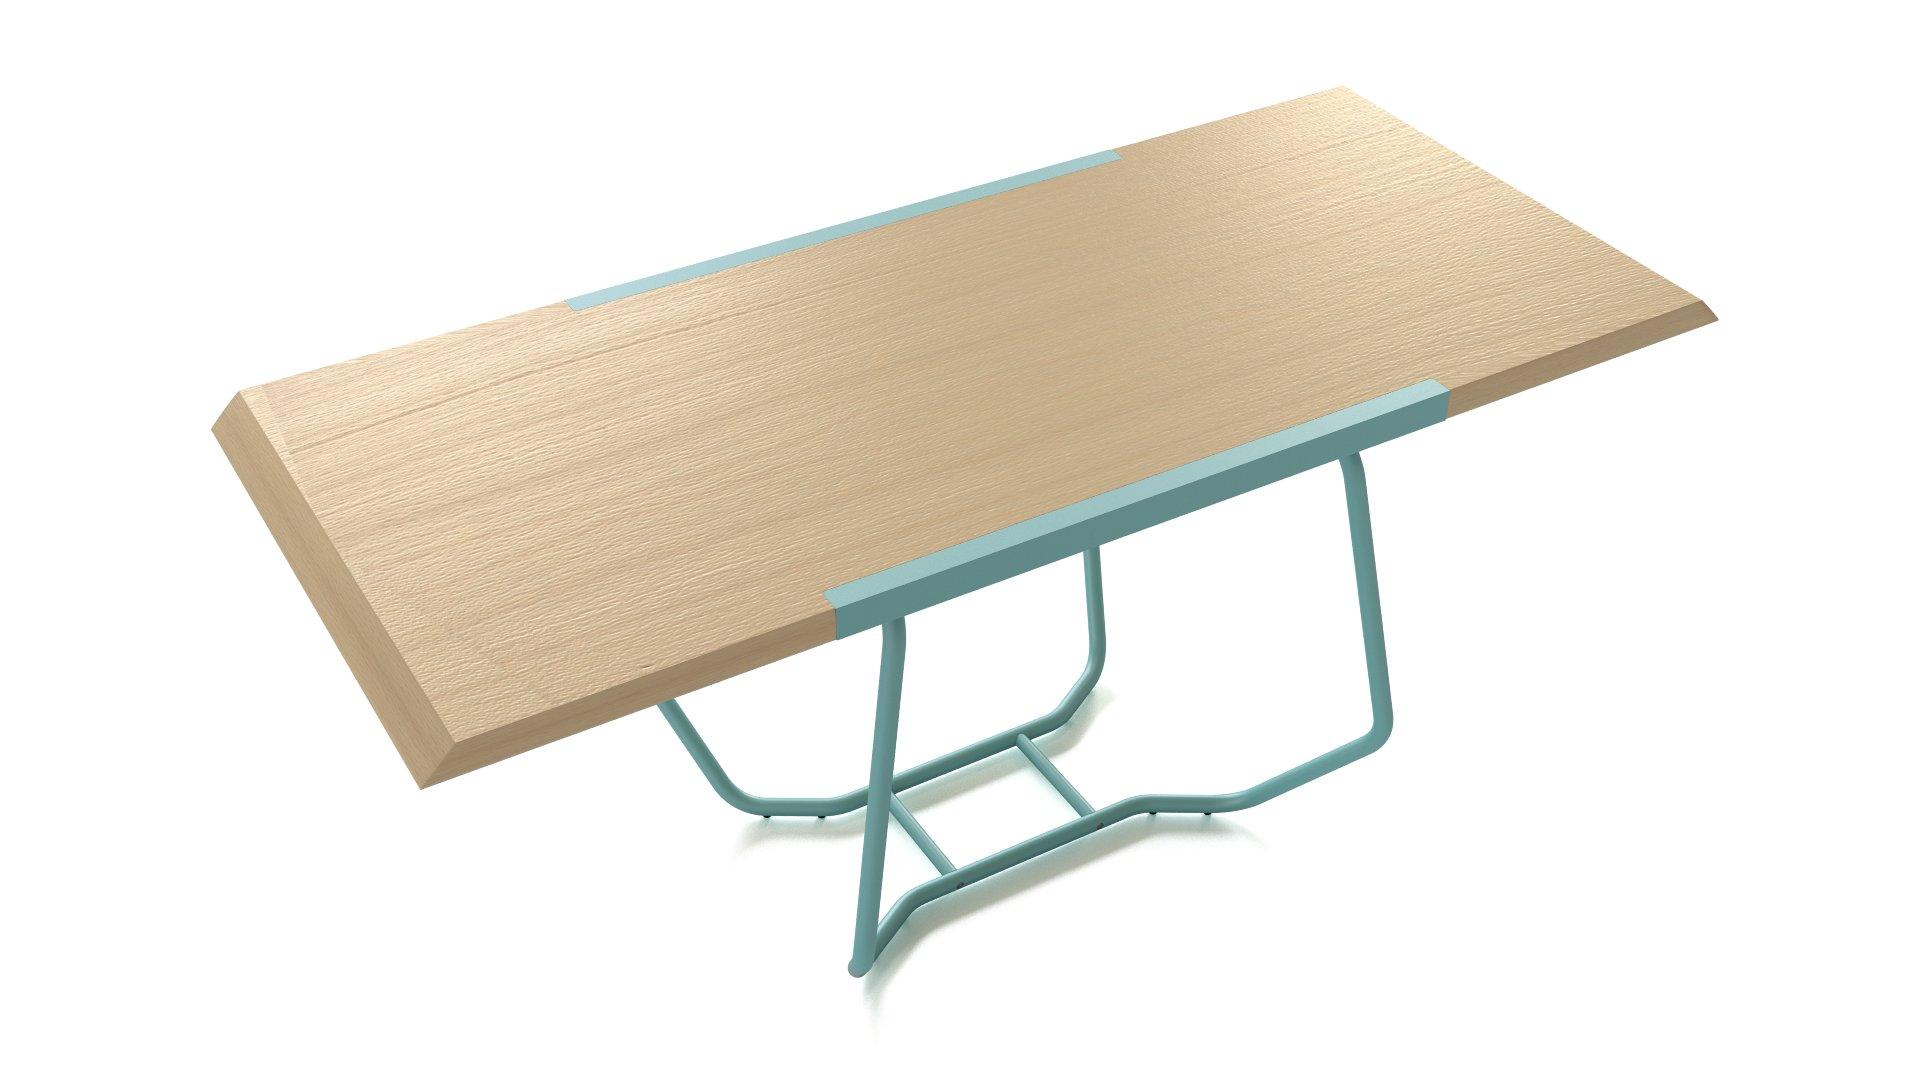 Dual table by Luca Binaglia